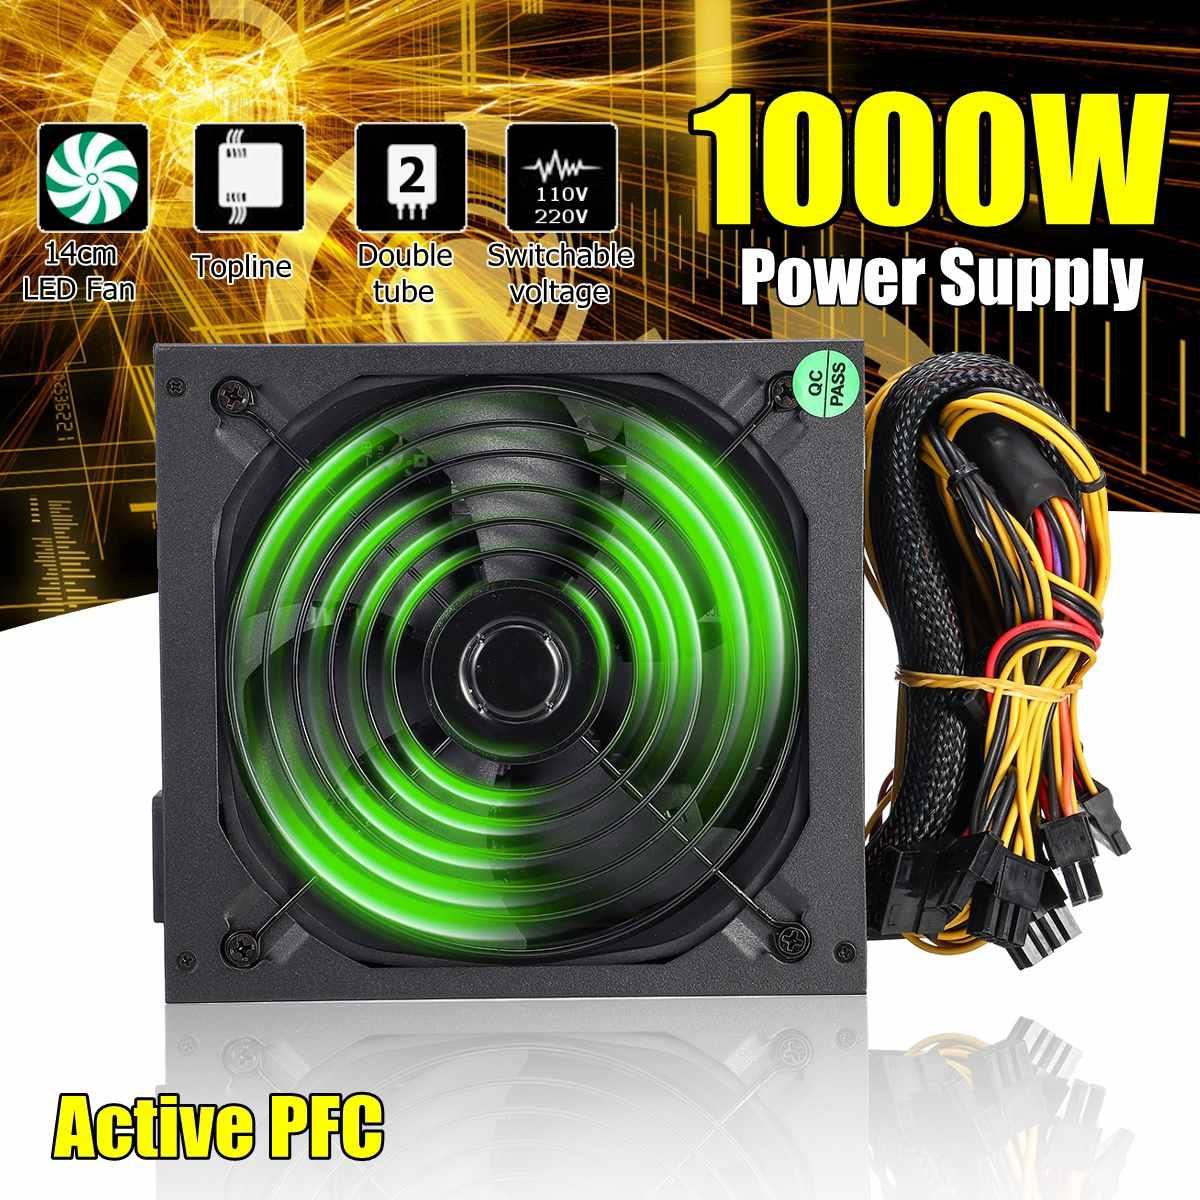 110 ~ 220 V 1000 W PC alimentation 140mm ventilateur LED 24 broches actif PFC PCI SATA ATX 12 V ordinateur alimentation